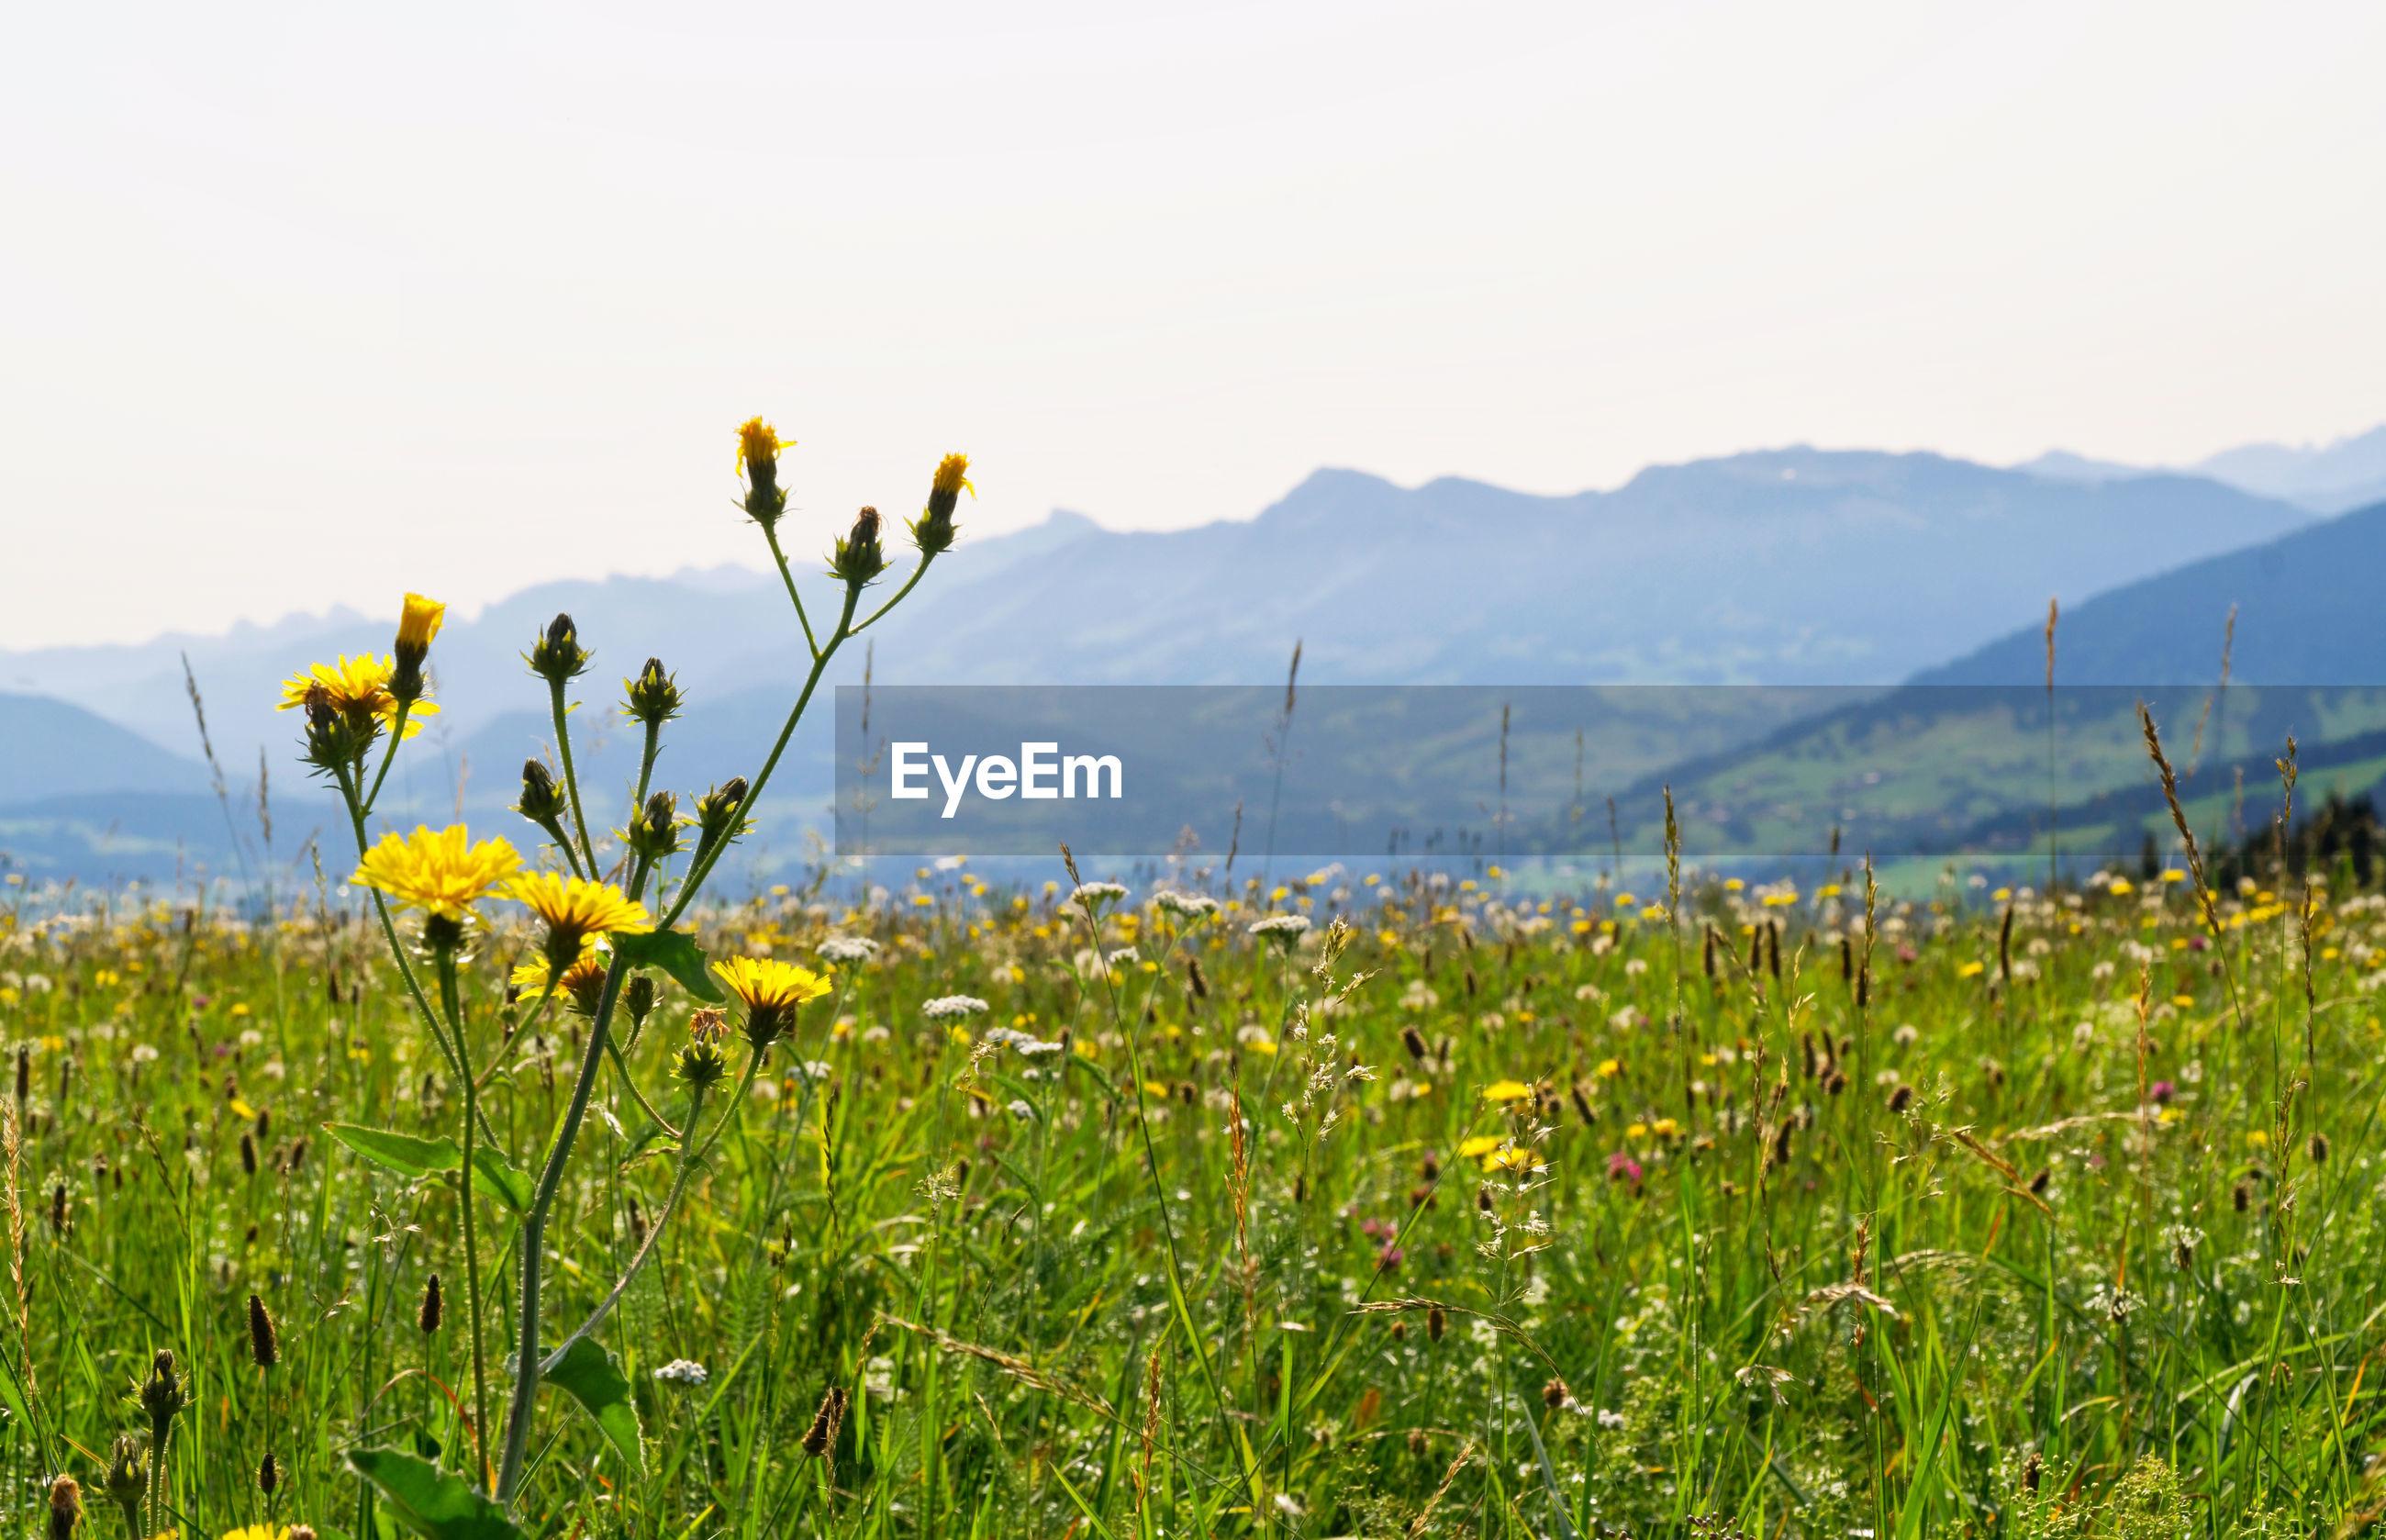 YELLOW FLOWERING PLANTS GROWING ON FIELD AGAINST SKY